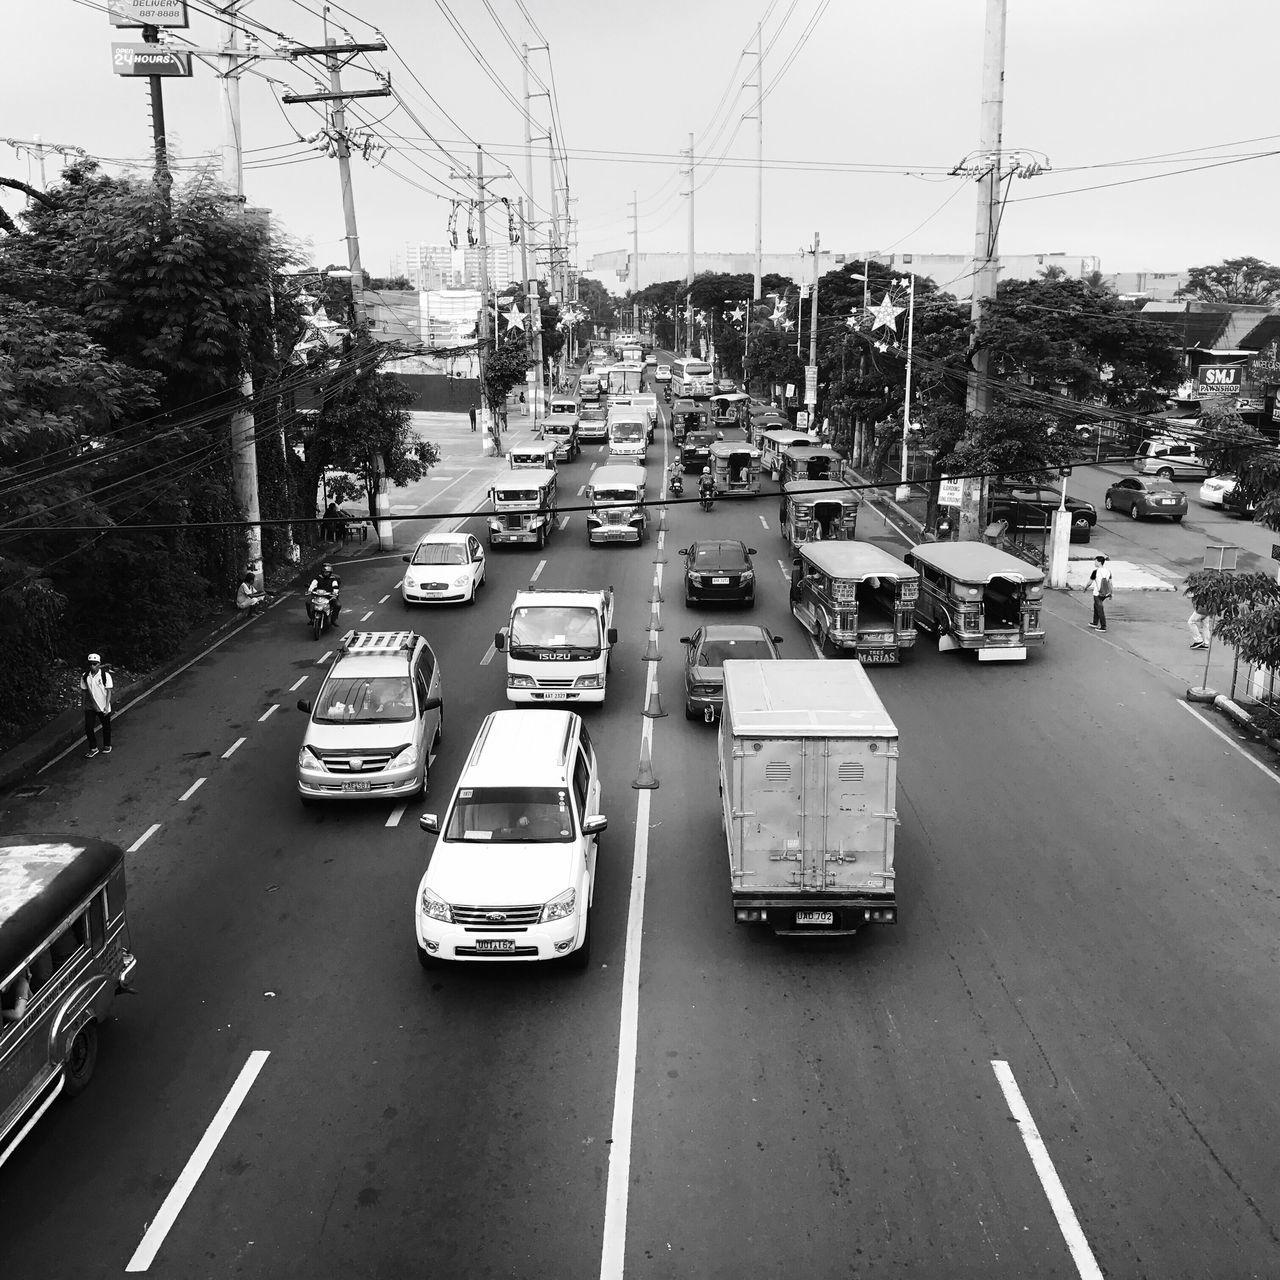 Car Street Day Eyeem Philippines Las Piñas City Zapote Traffic